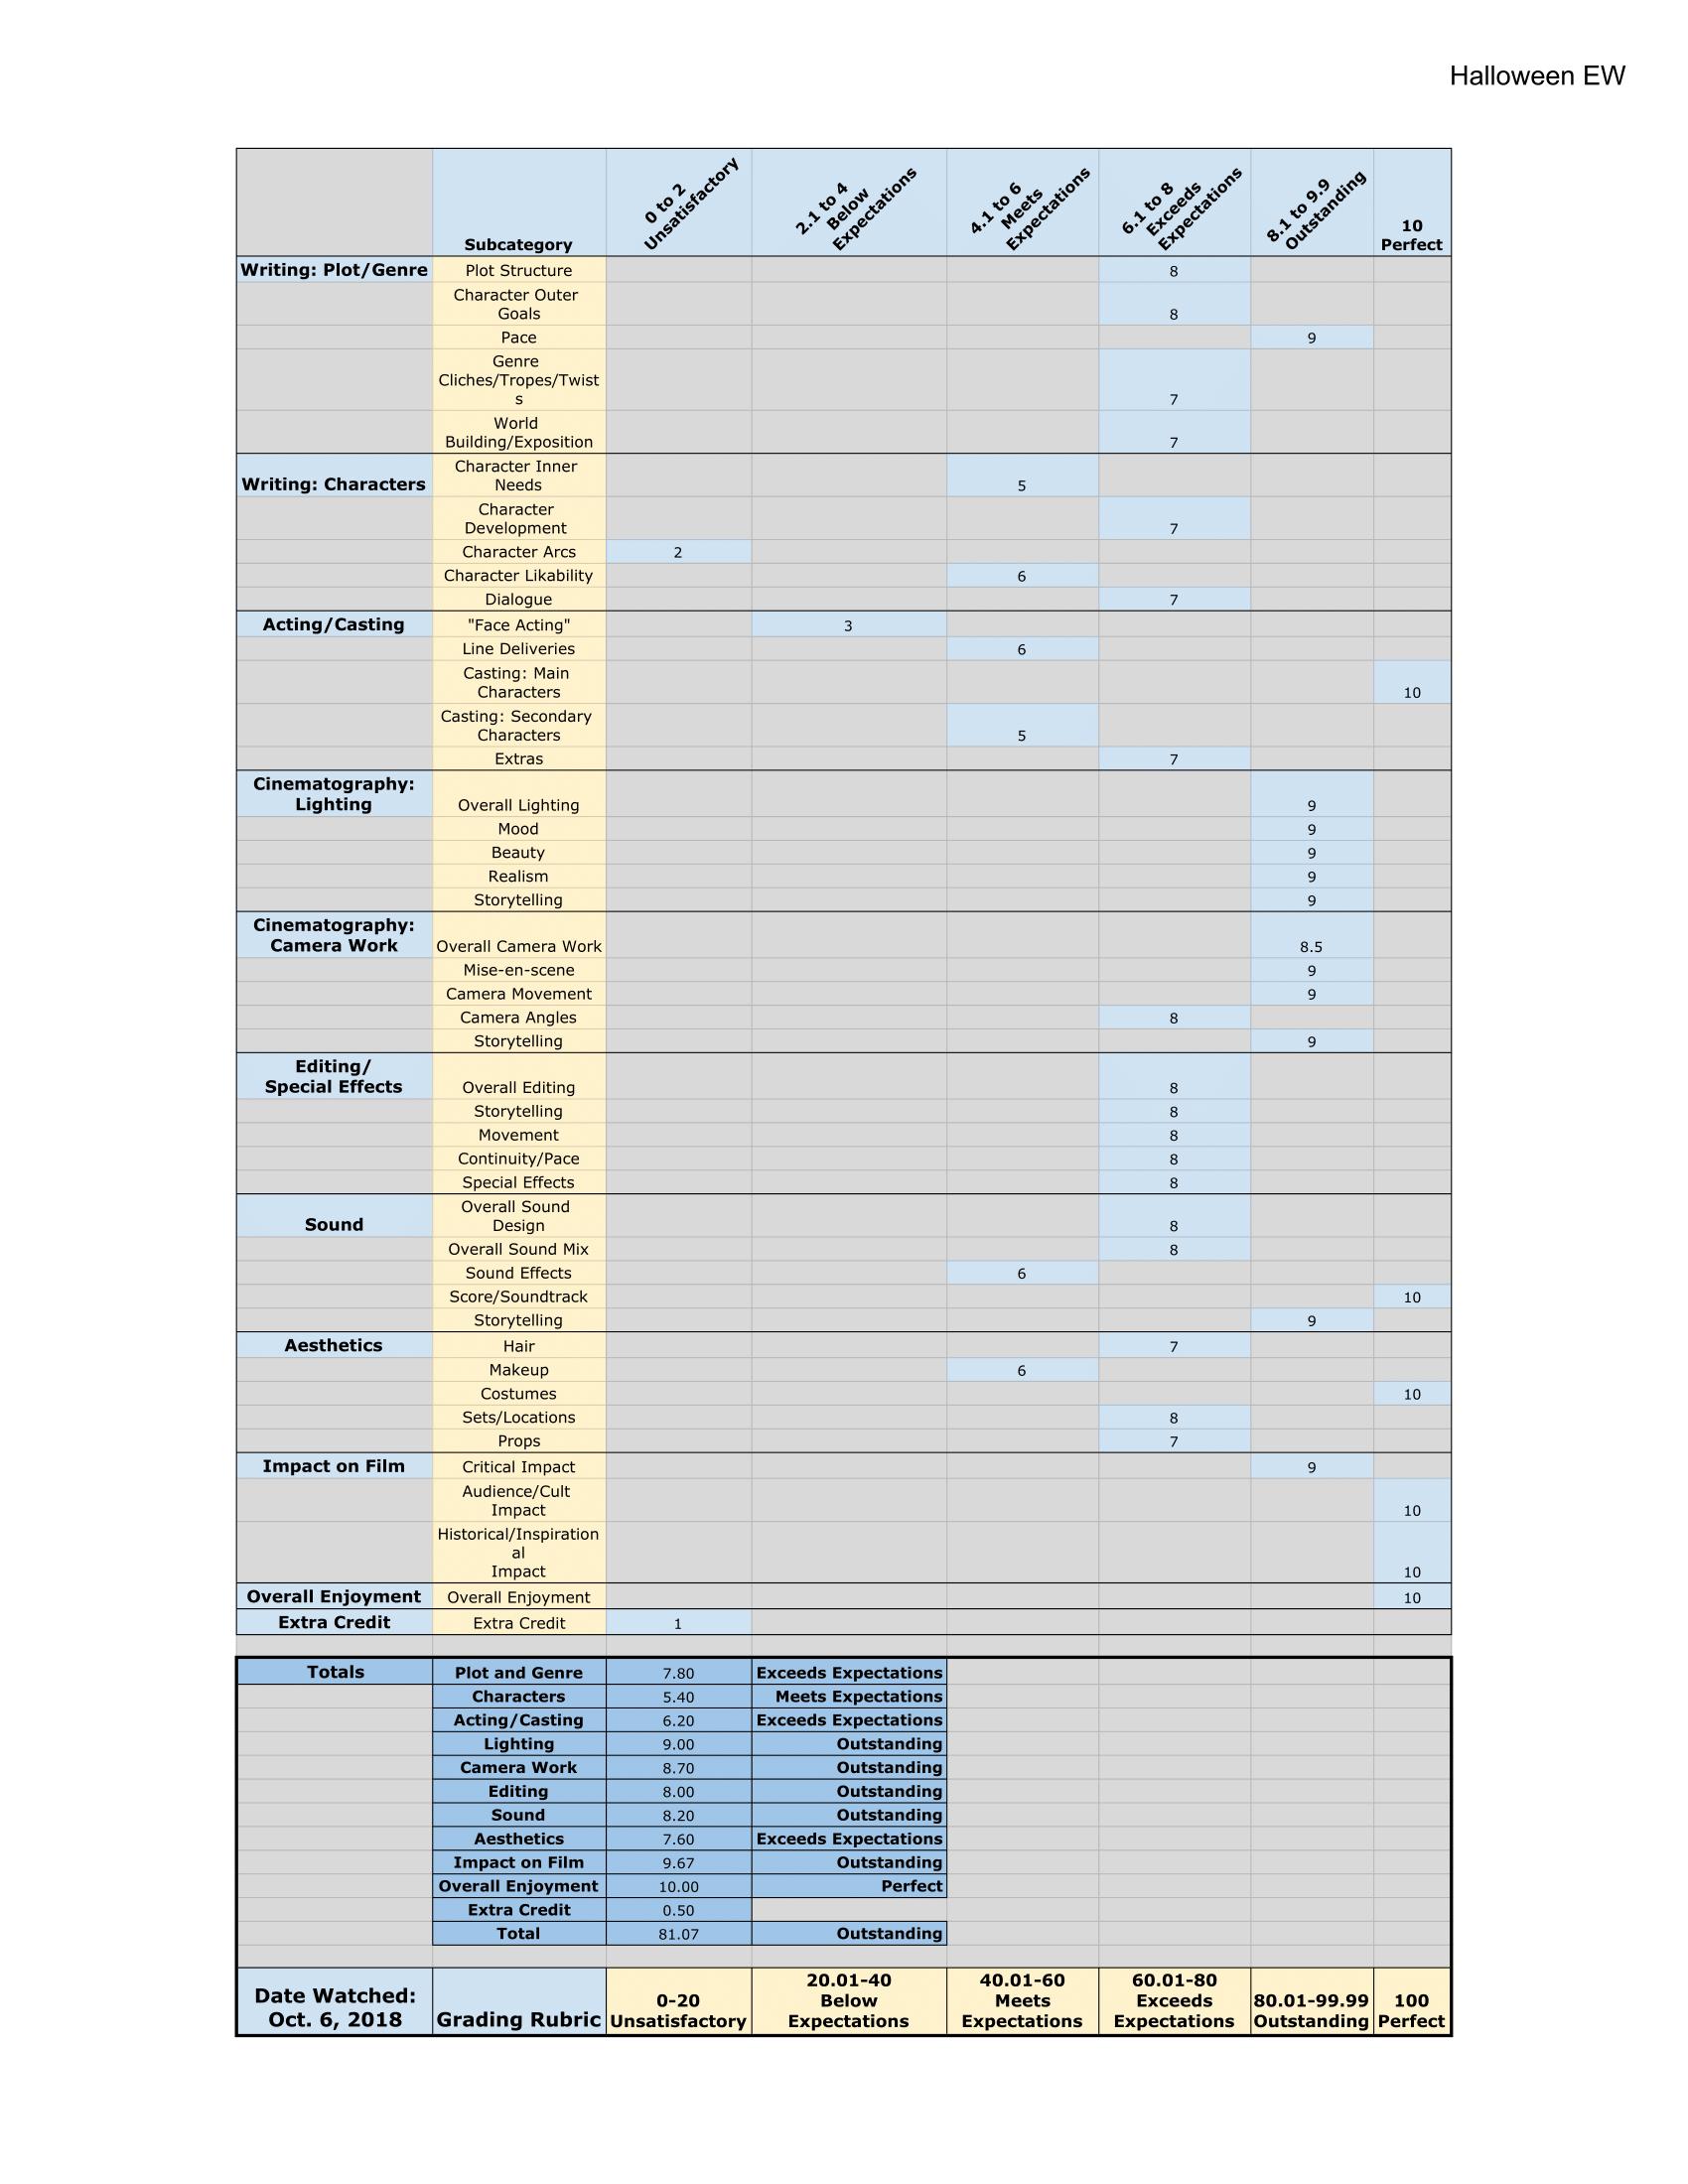 Untitled spreadsheet - Halloween EW-1.png